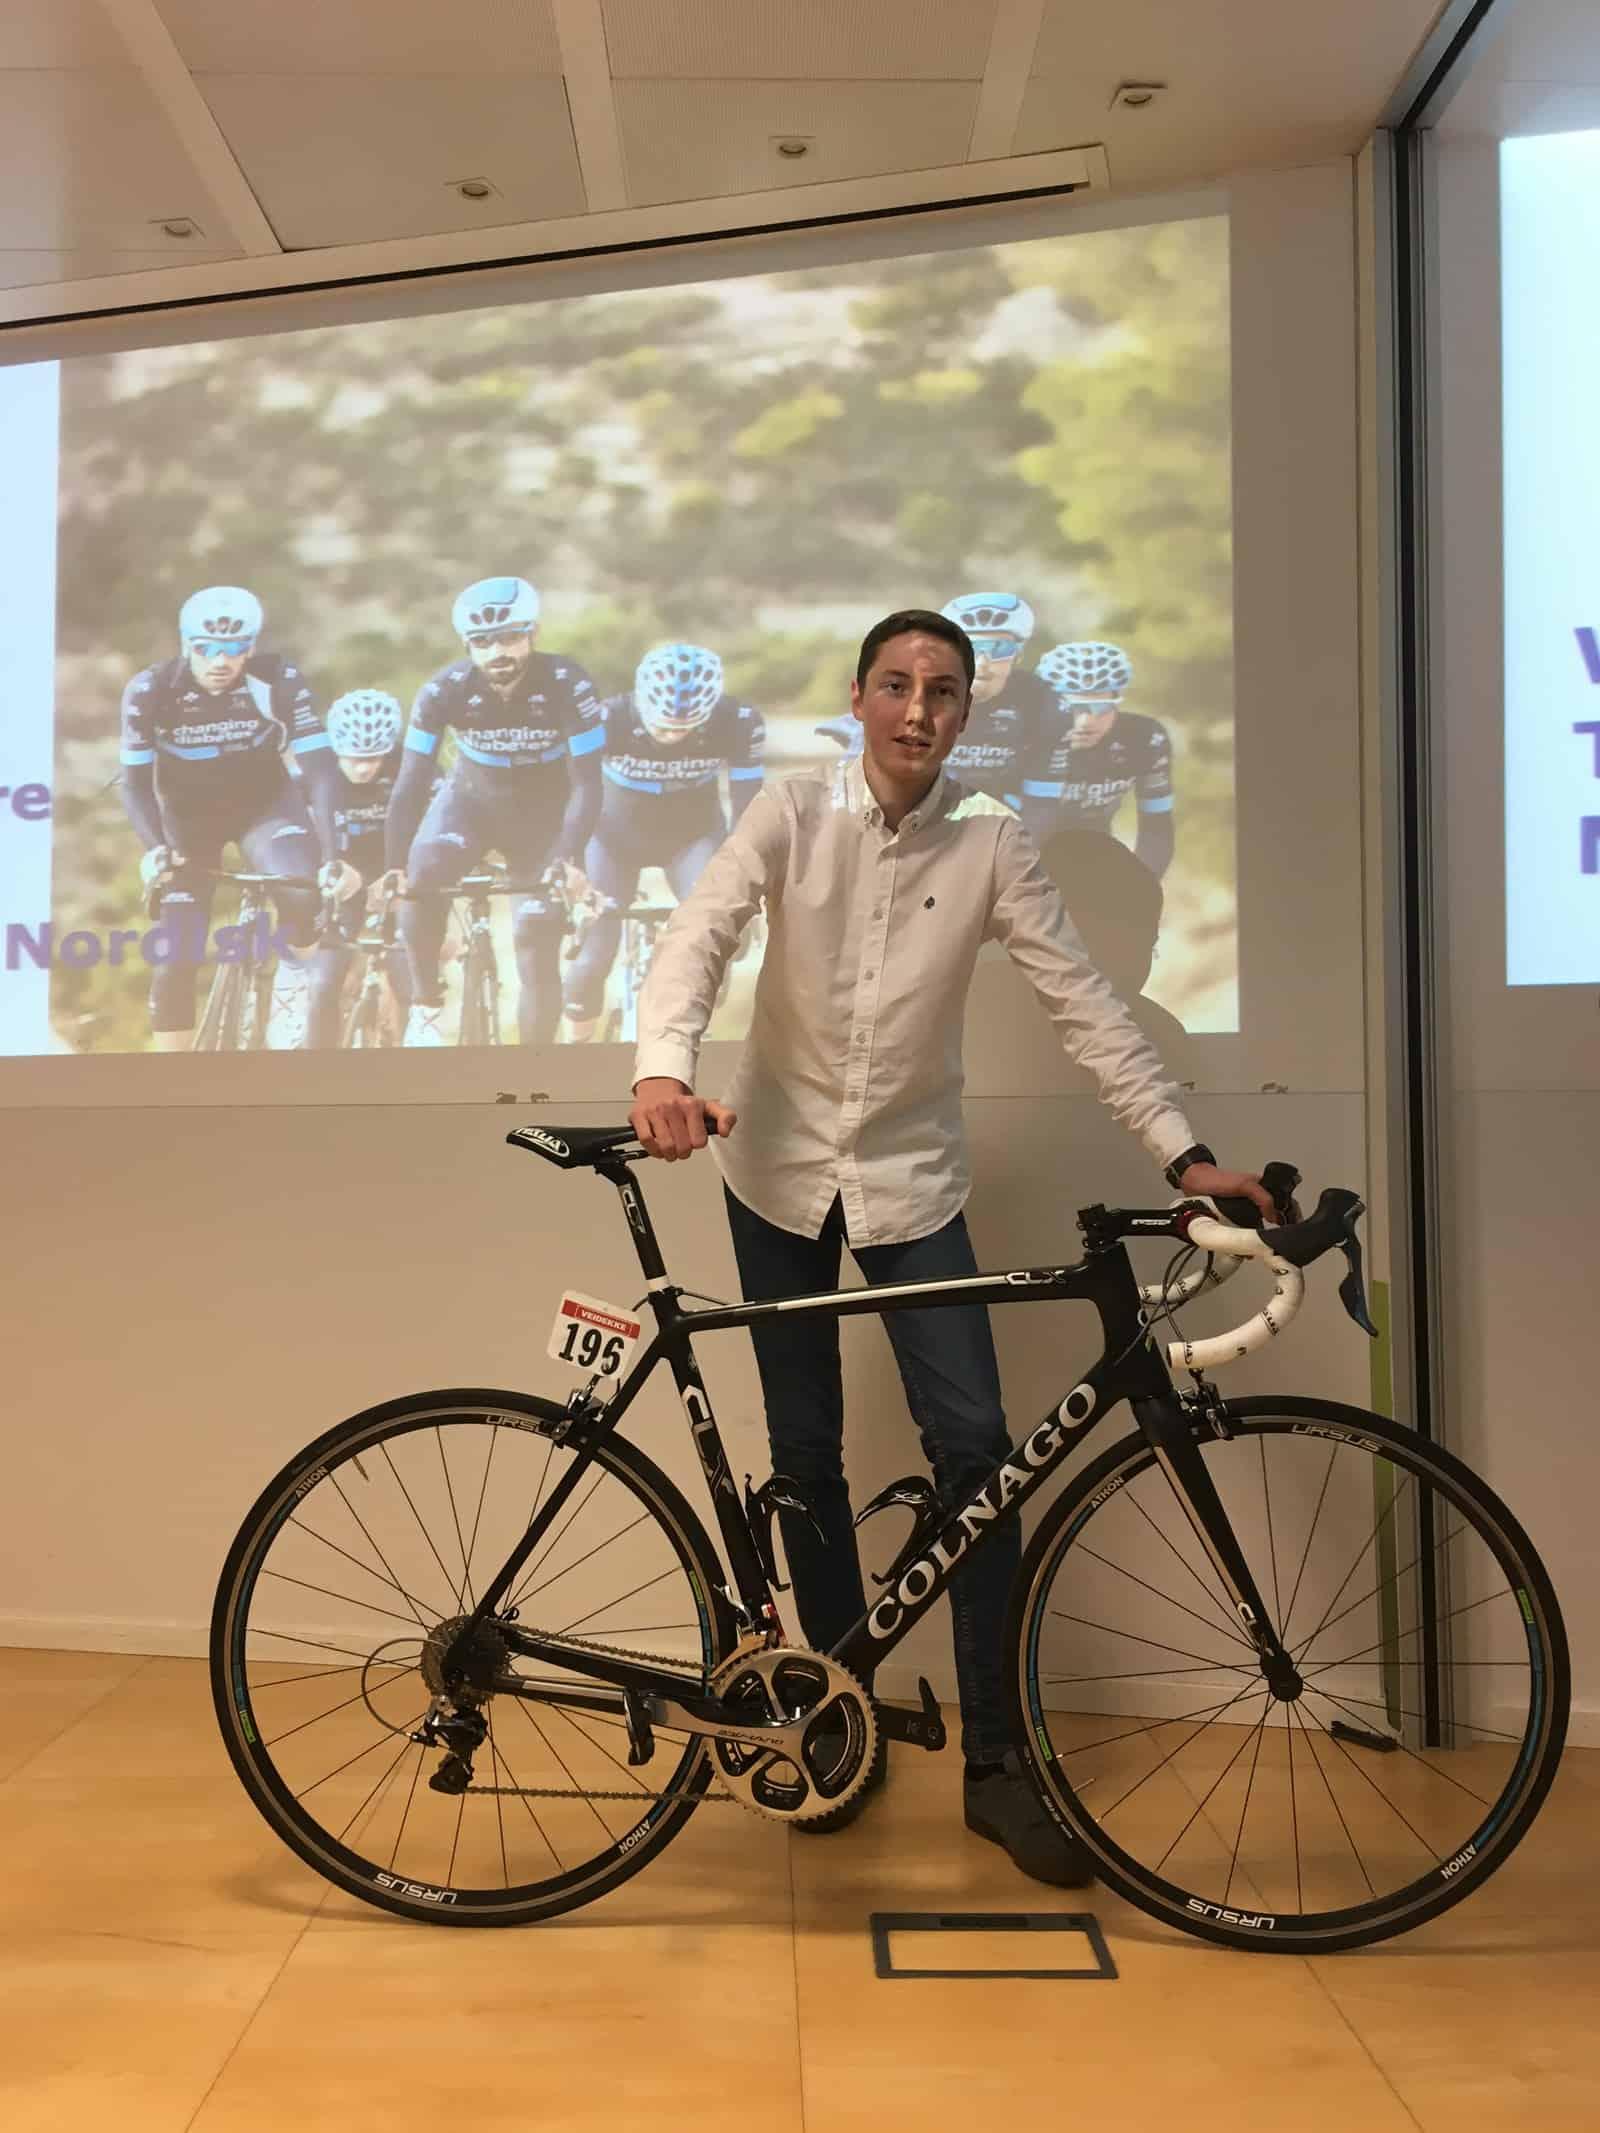 TNN Presents Colnago Bike to Contest Winner in Madrid